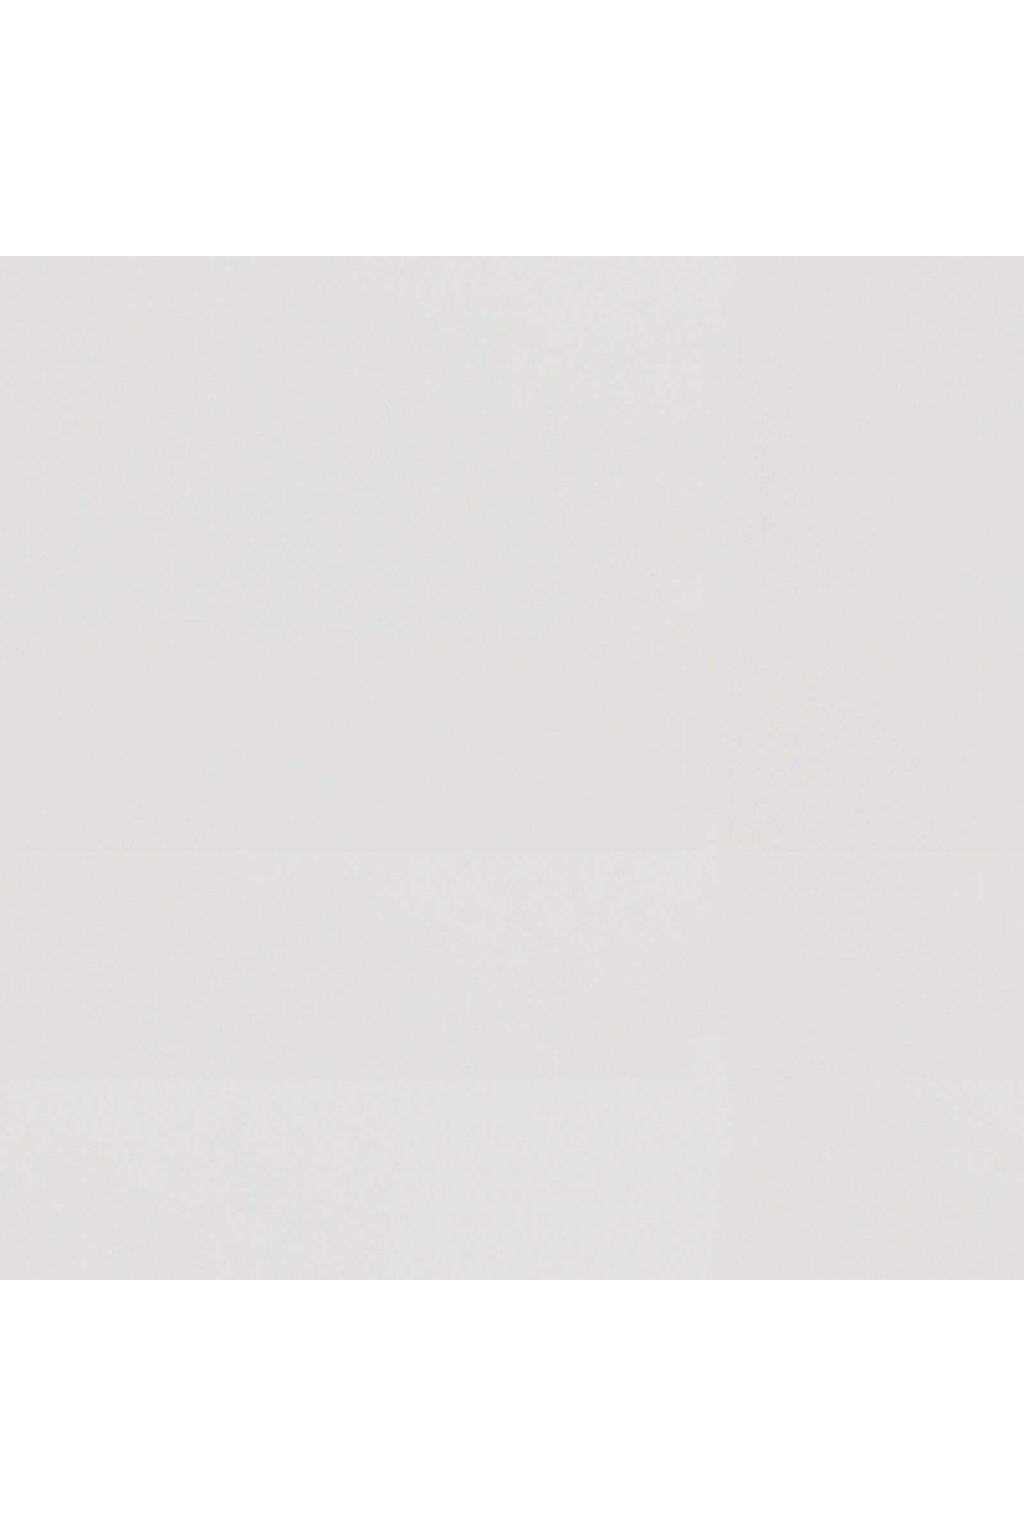 Hrany - ABS - 43x1,5 - plang - HG White HG